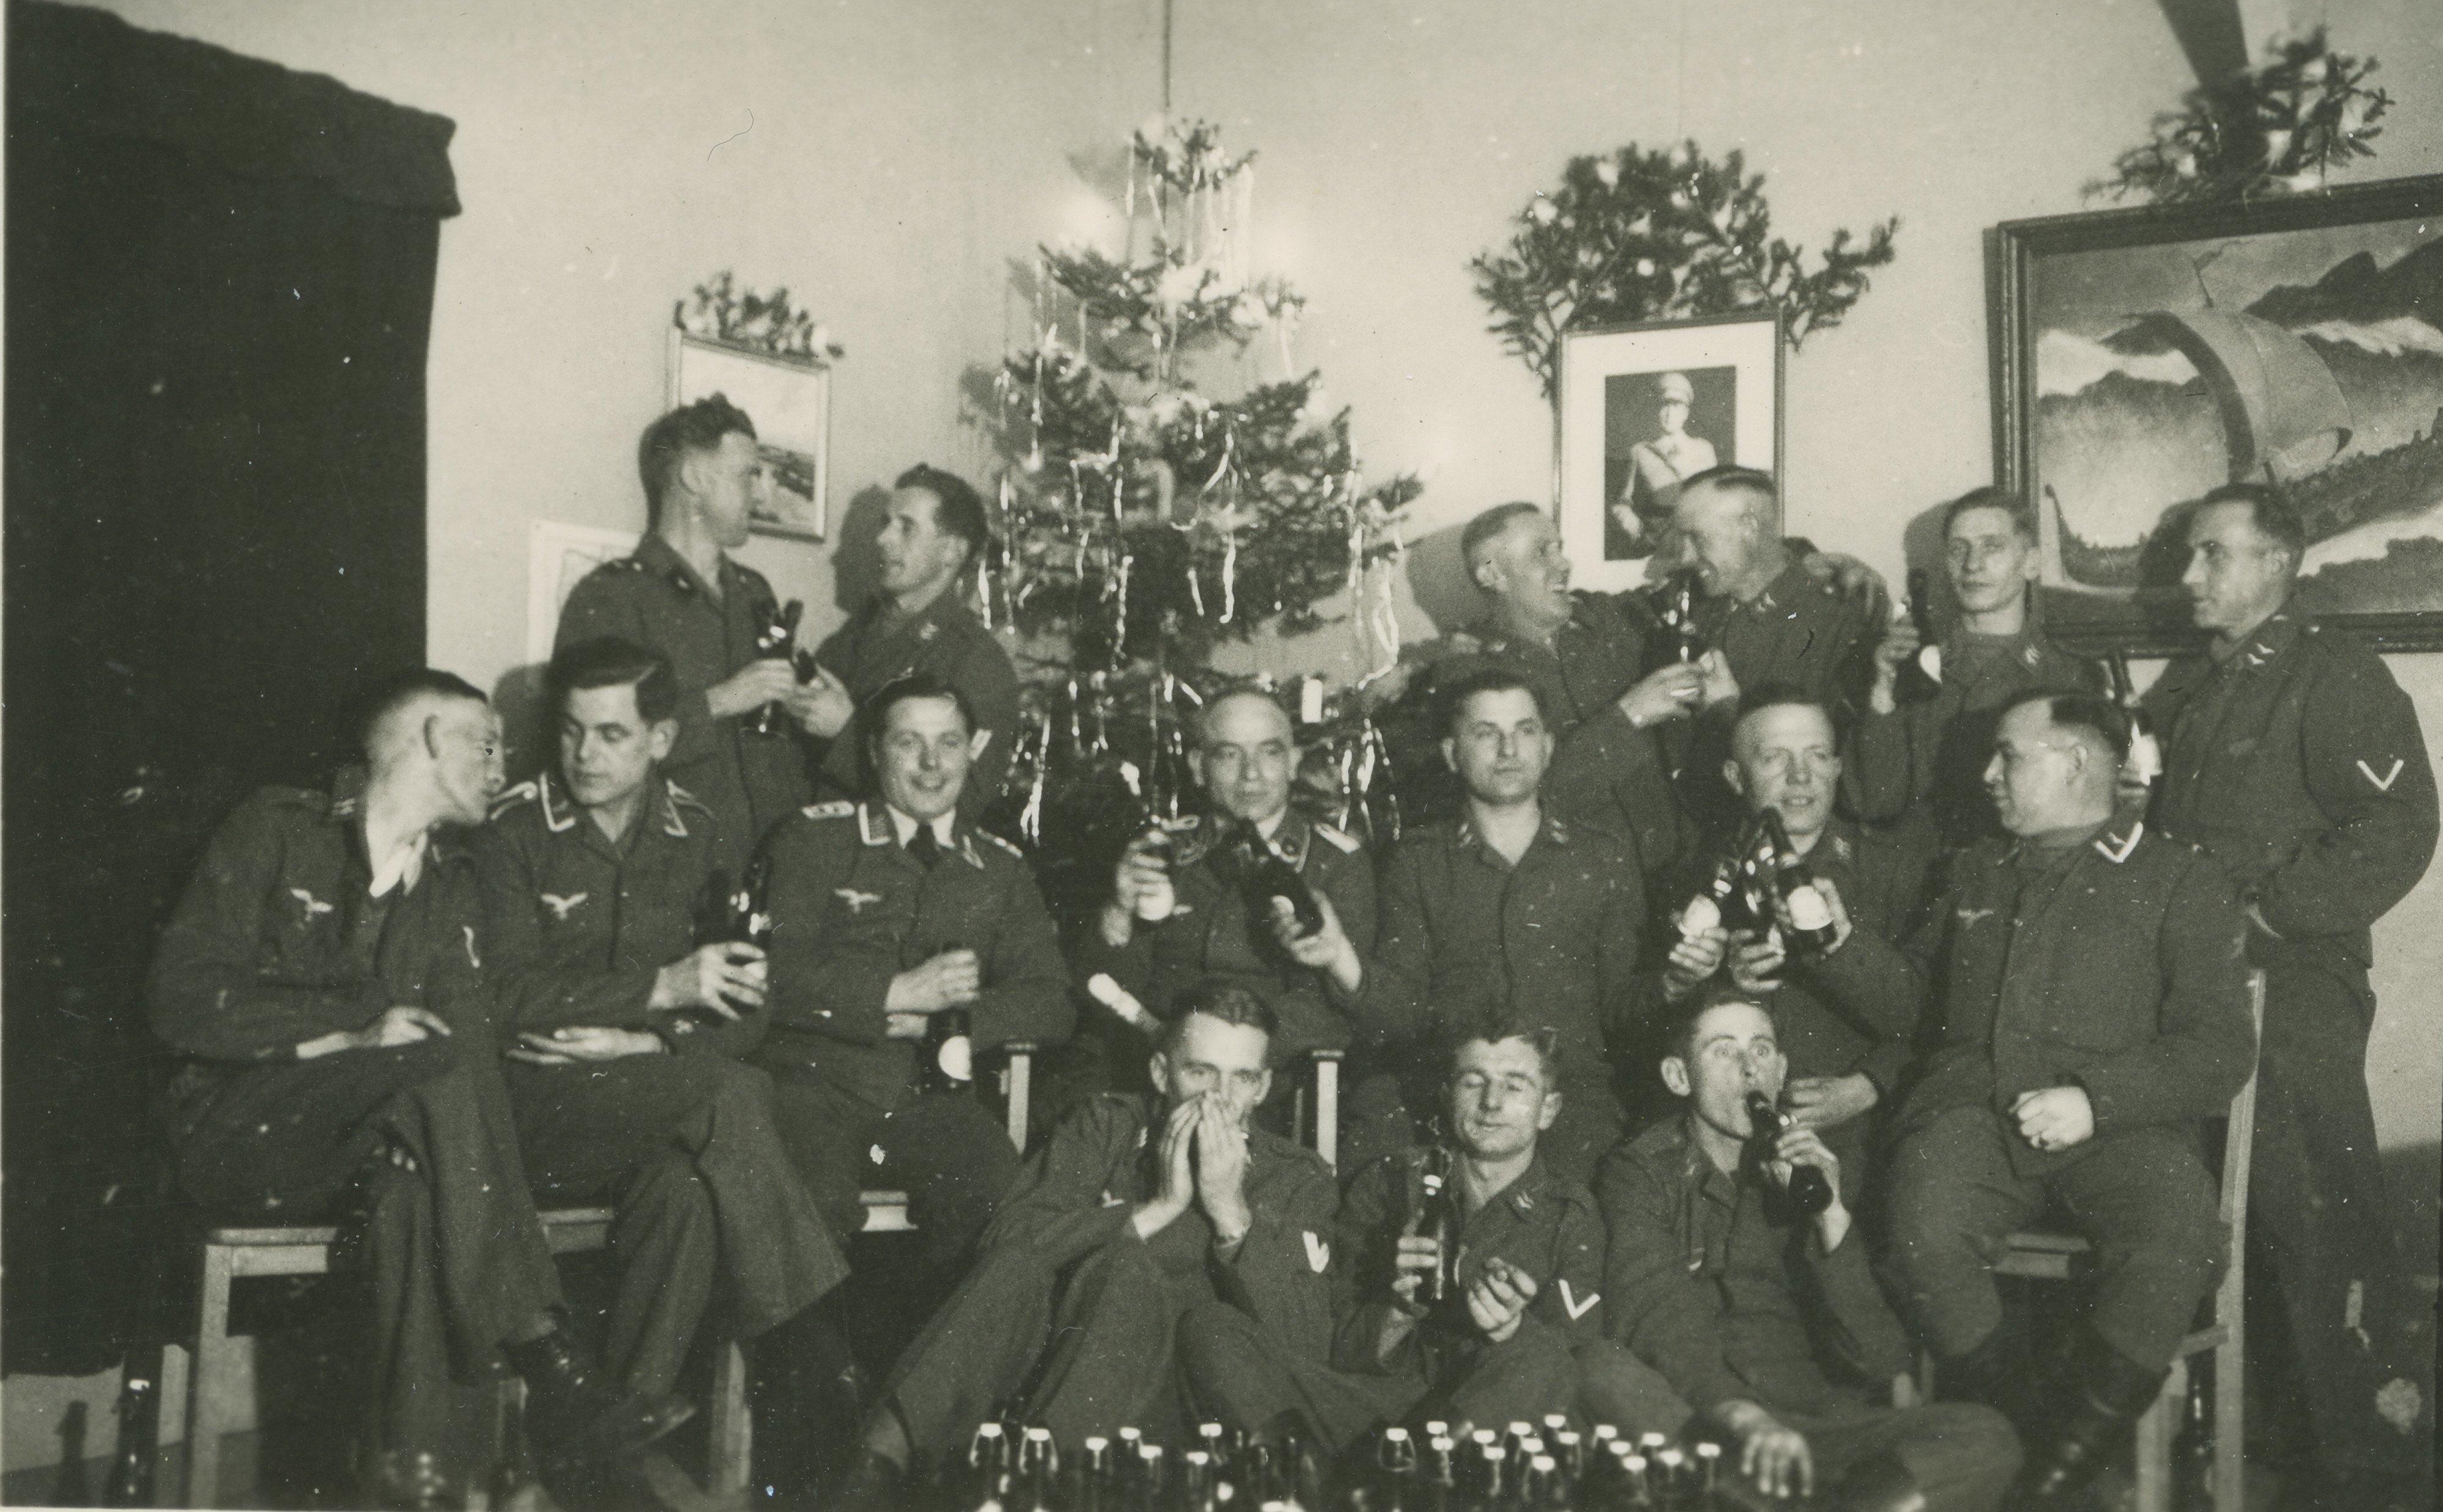 Luftwaffe personeel viert kerst op vliegveld Soesterberg